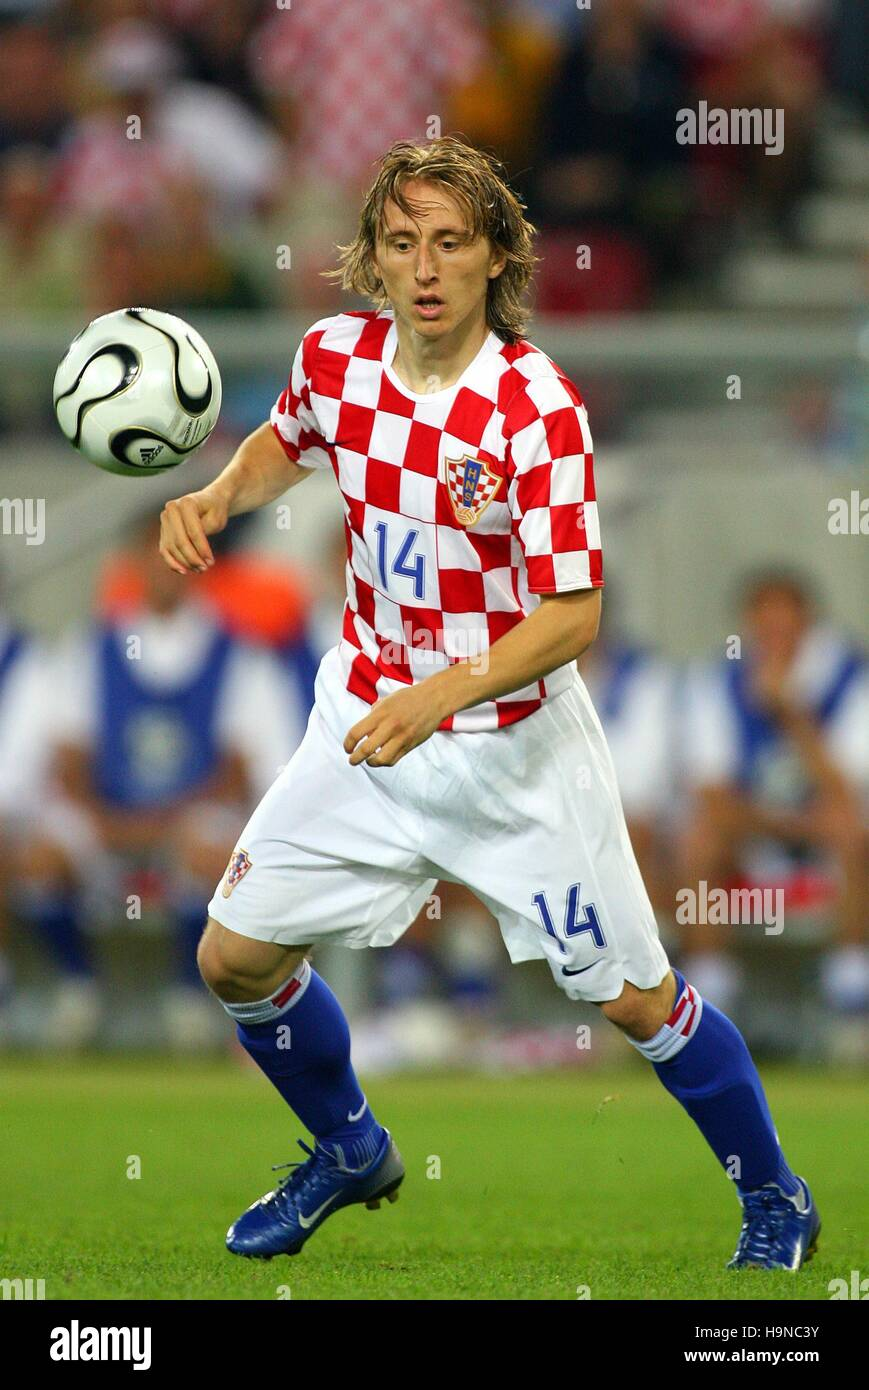 LUKA MODRIC CROATIA & DINAMO ZAGREB WORLD CUP STUTTGART GERMANY 22